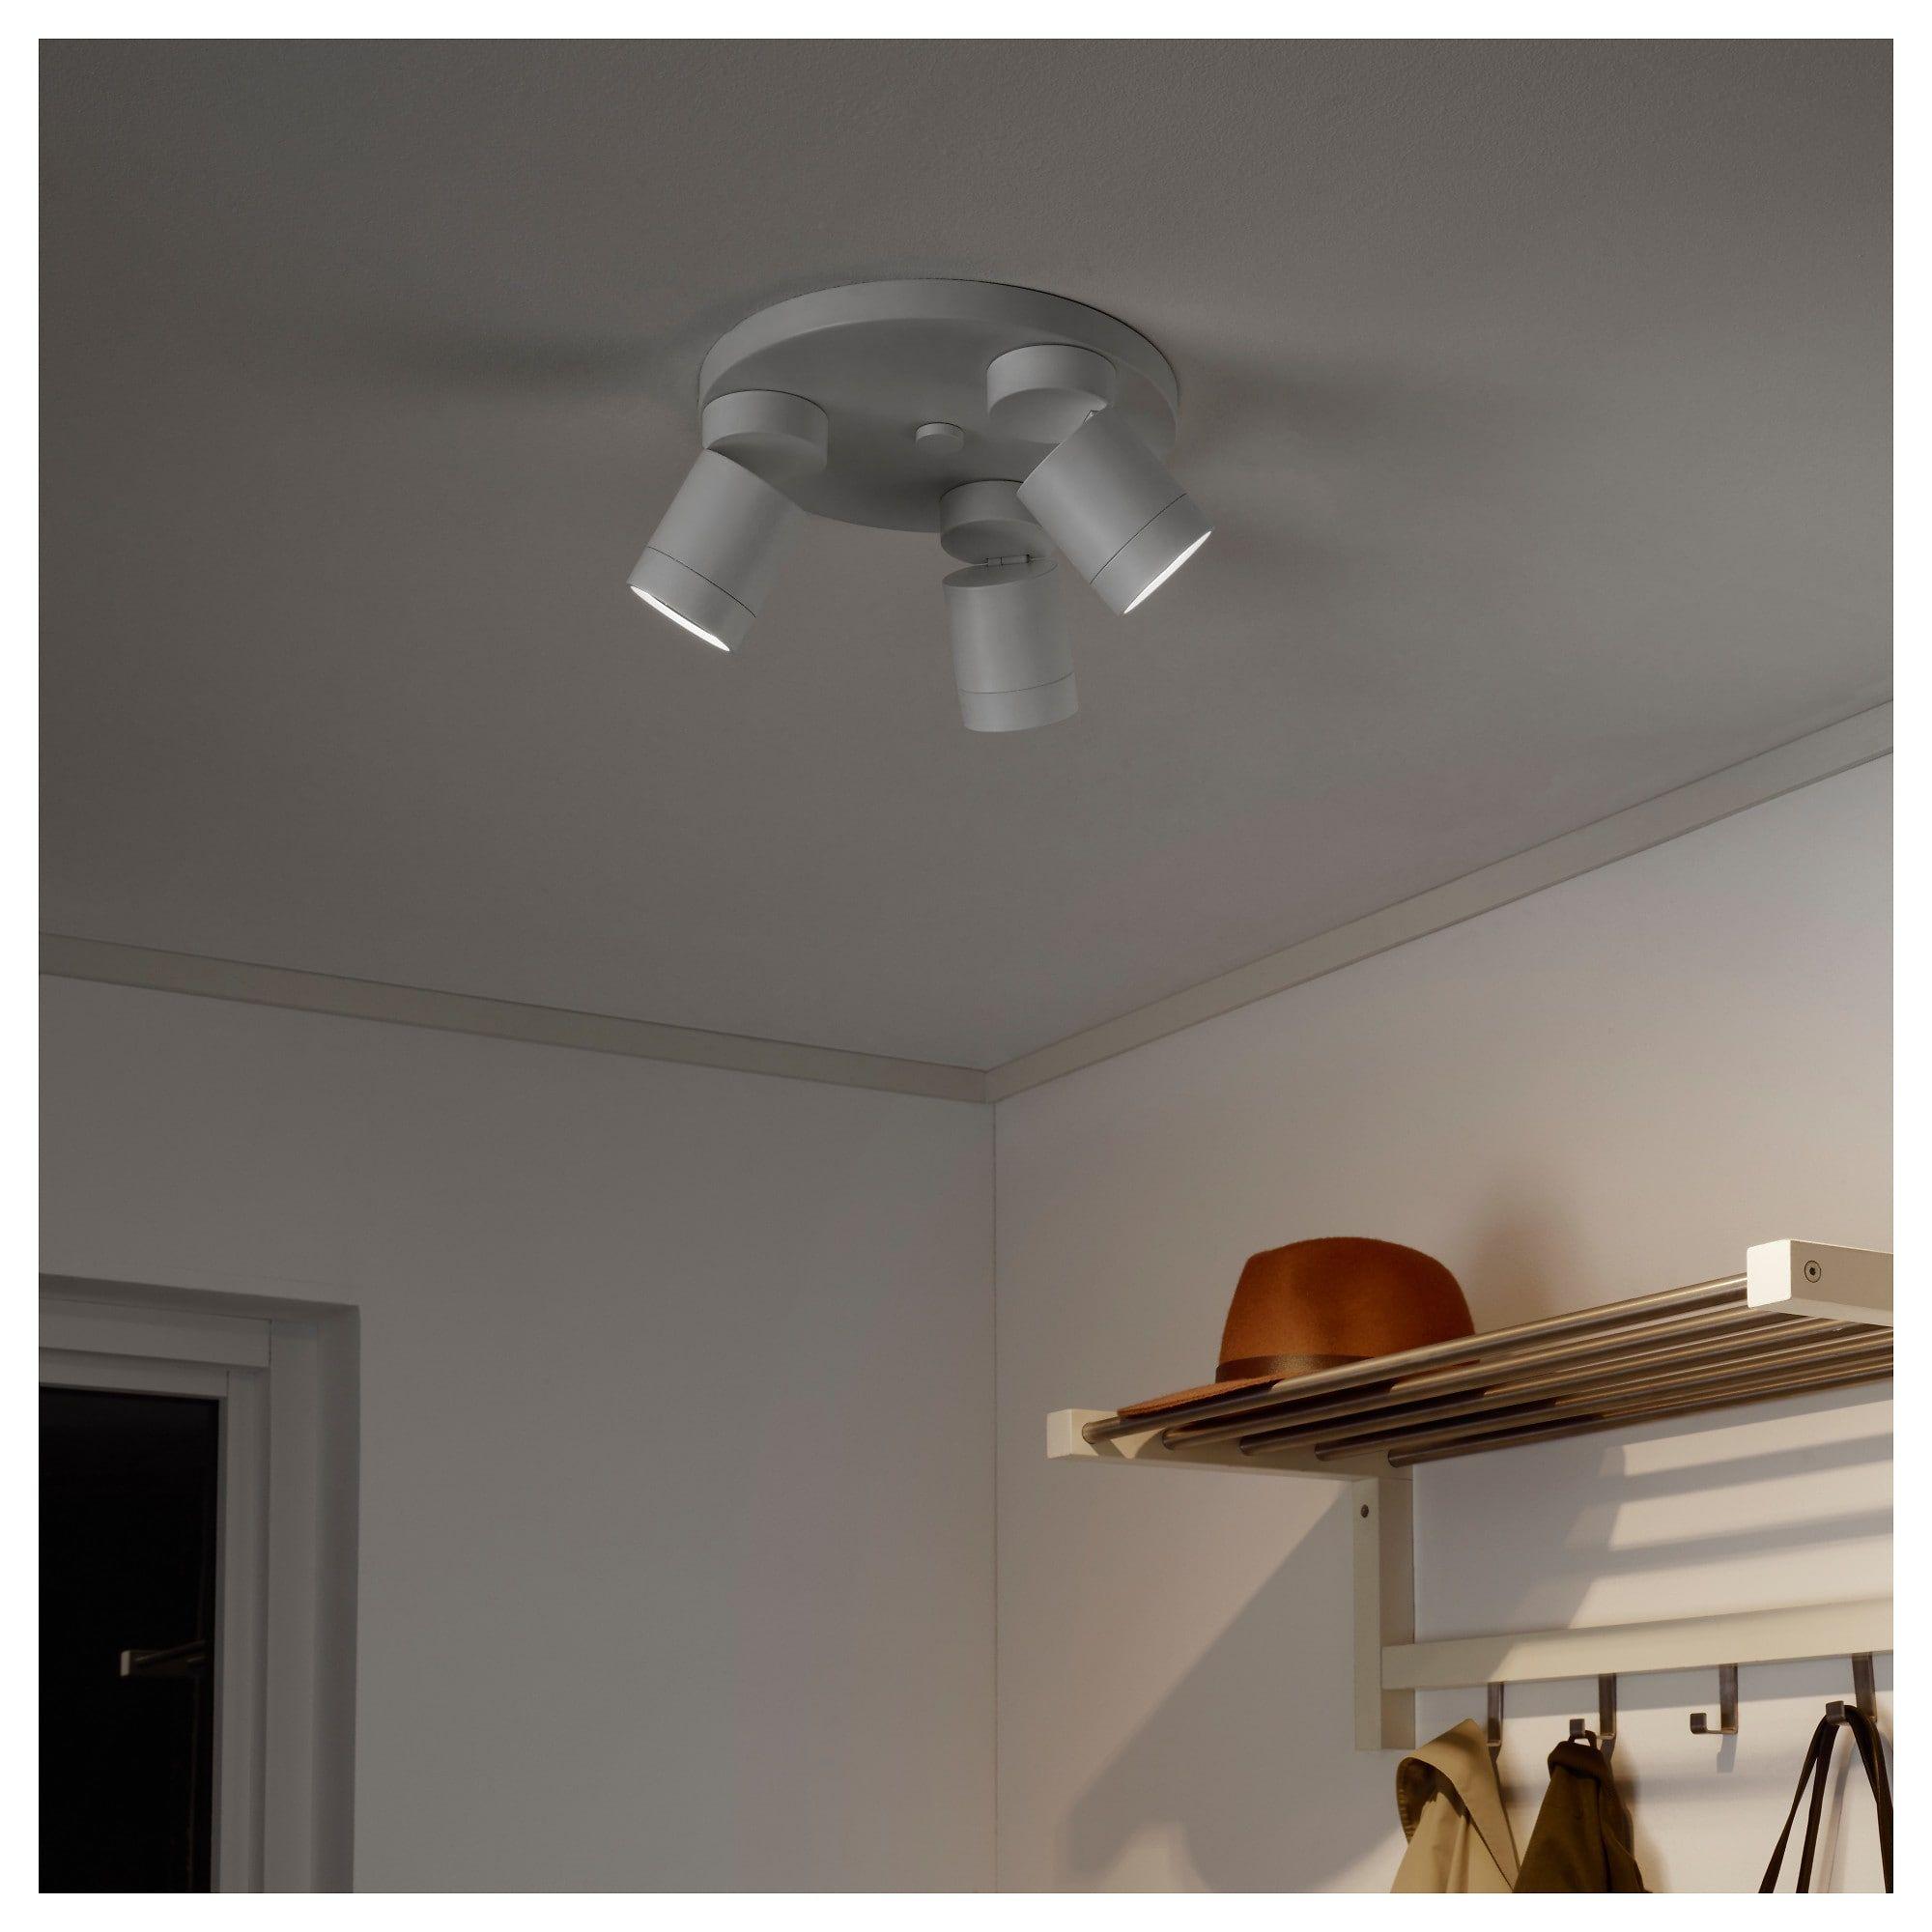 Ikea Nymane Ceiling Spotlight With 3 Lights White Ceiling Spotlights Ikea Ikea Lamp